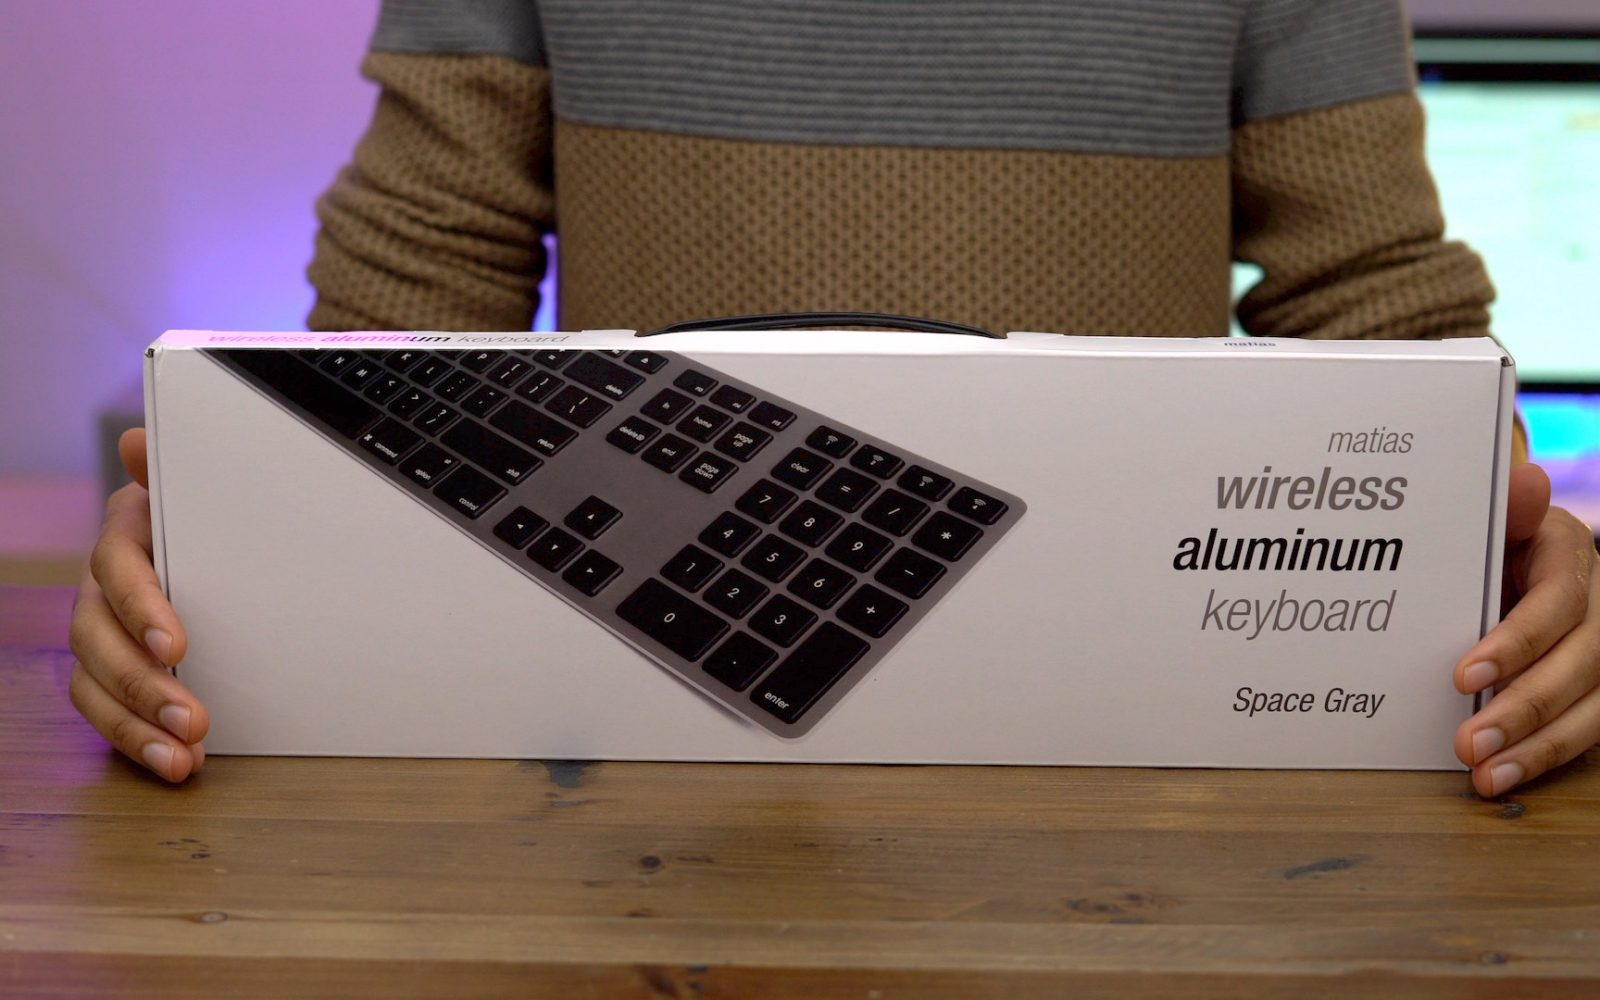 3054fe1b28f The Matias Wireless Aluminum Keyboard is the keyboard Apple should be  making [Video]